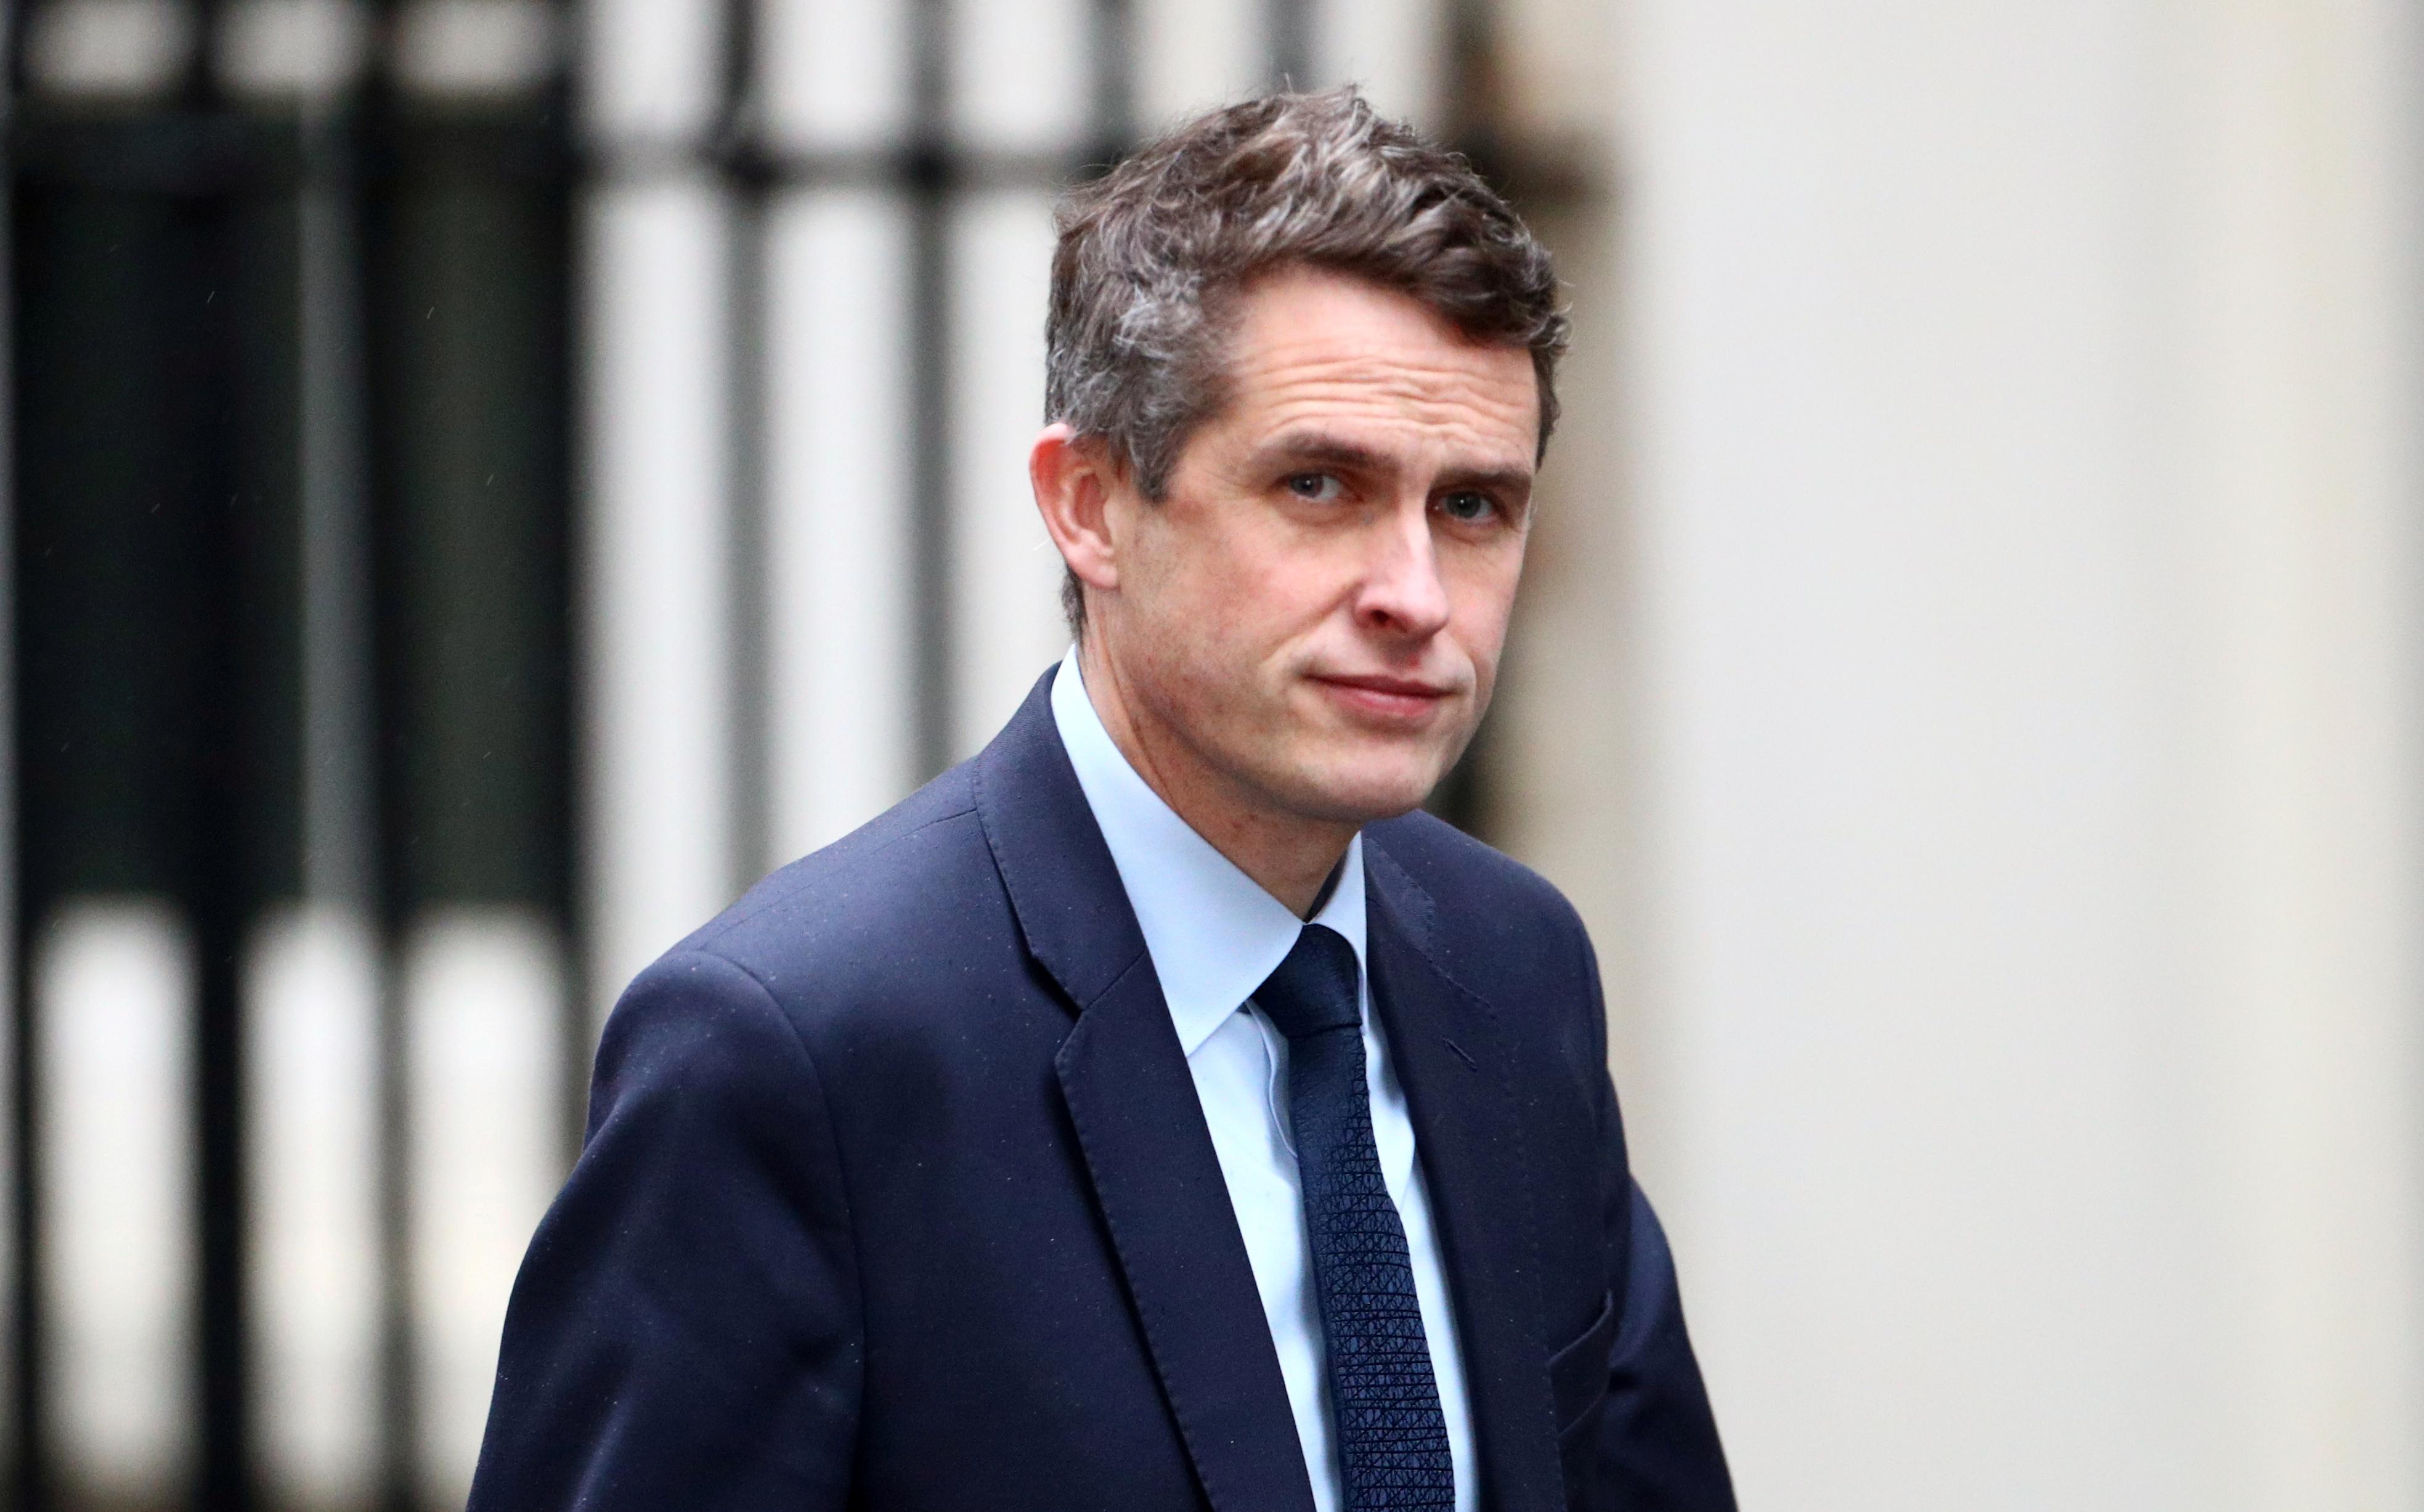 Britain's Education Secretary Gavin Williamson seen at Downing Street in London